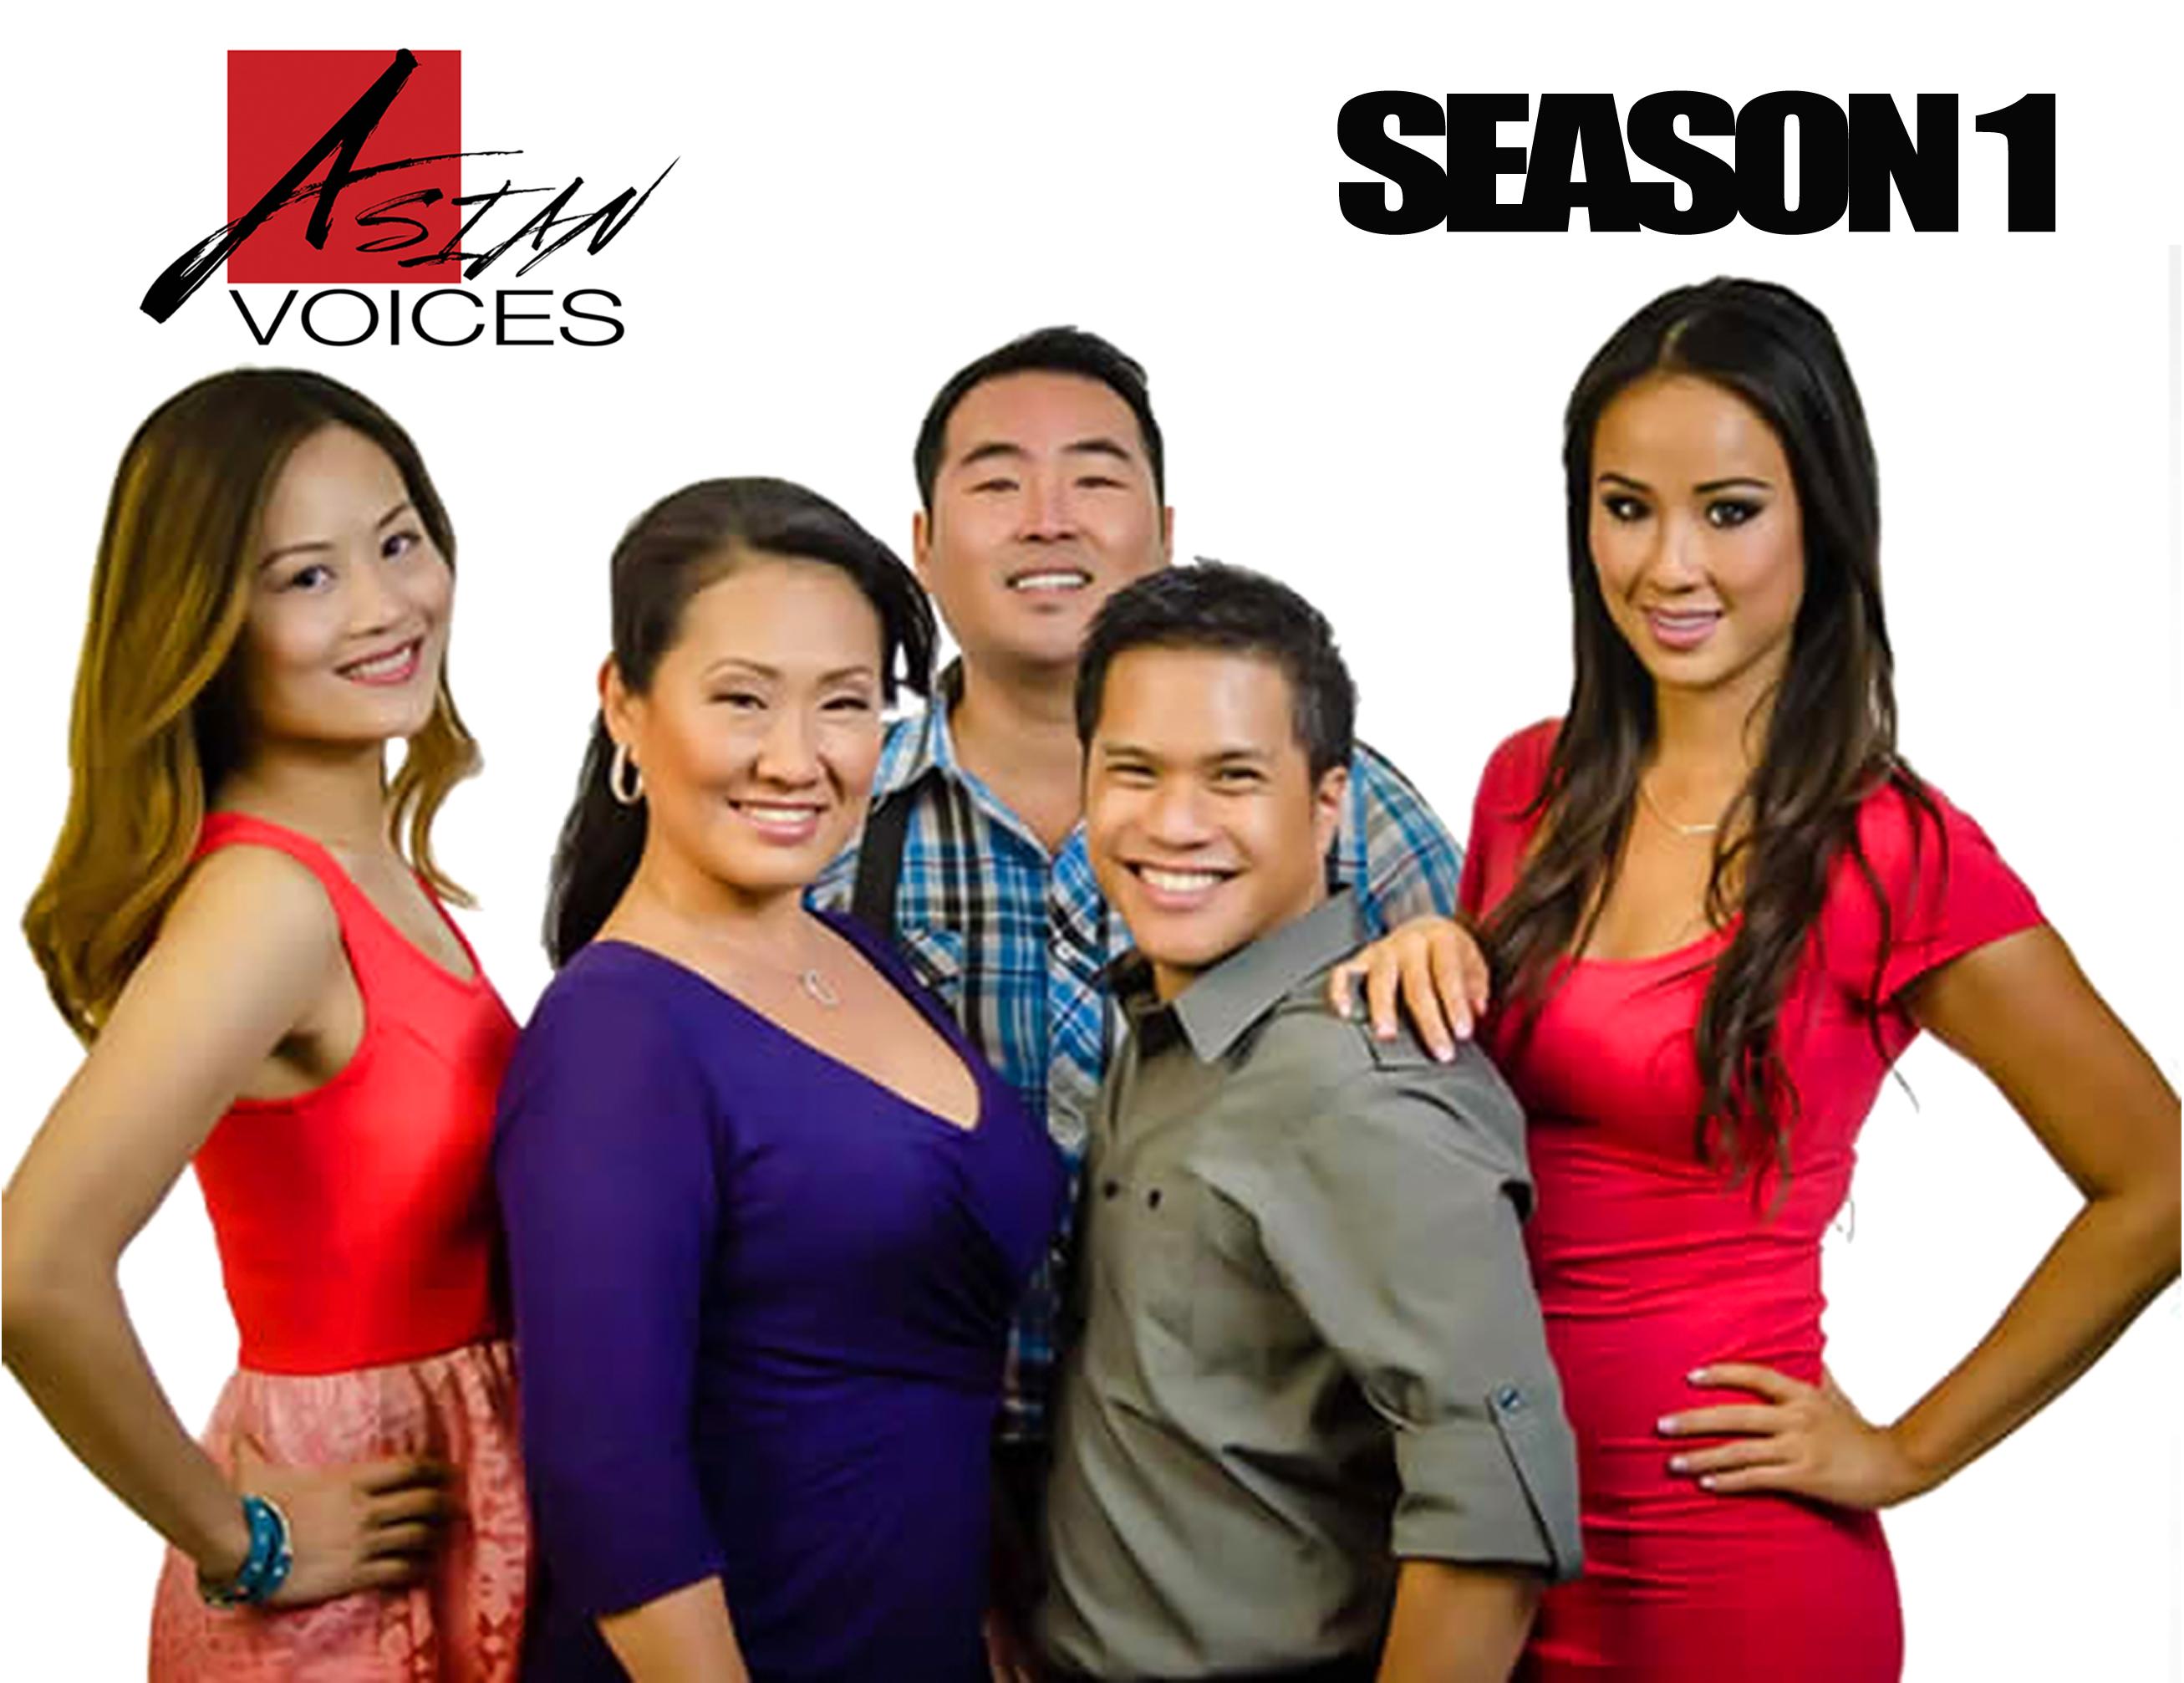 Season One Cast